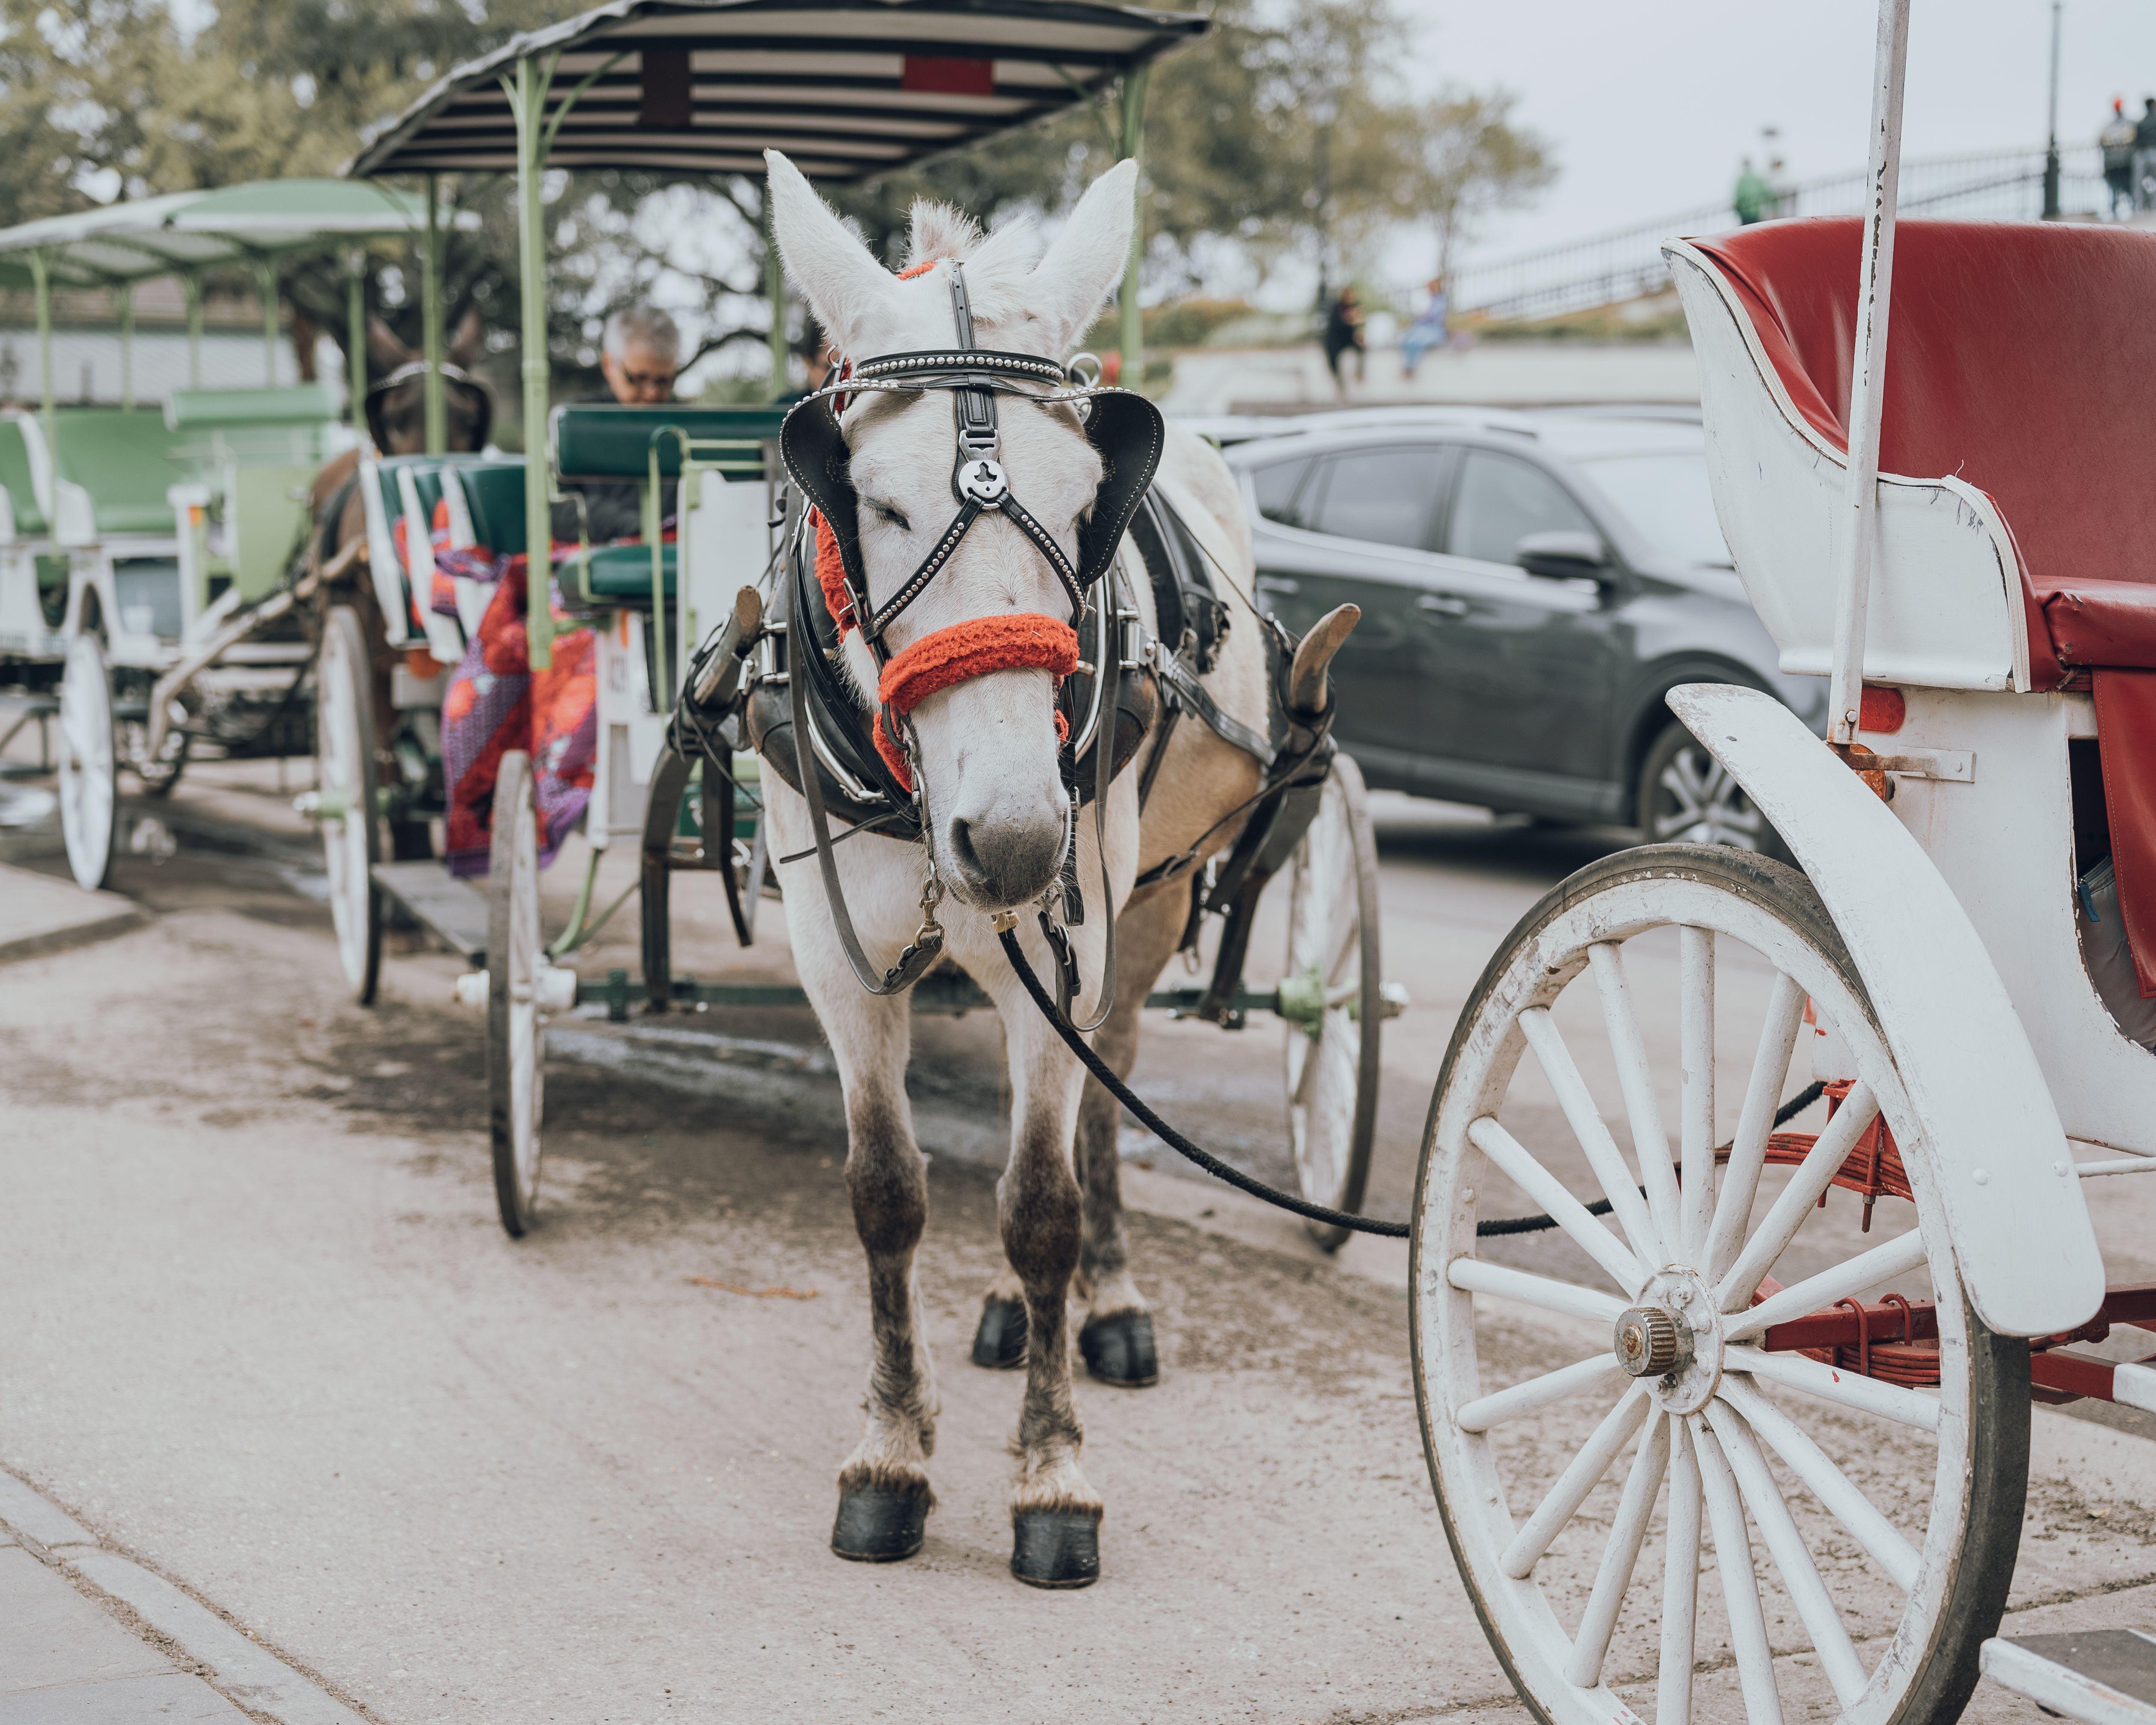 Carruajes tirados por caballos en Jackson Square